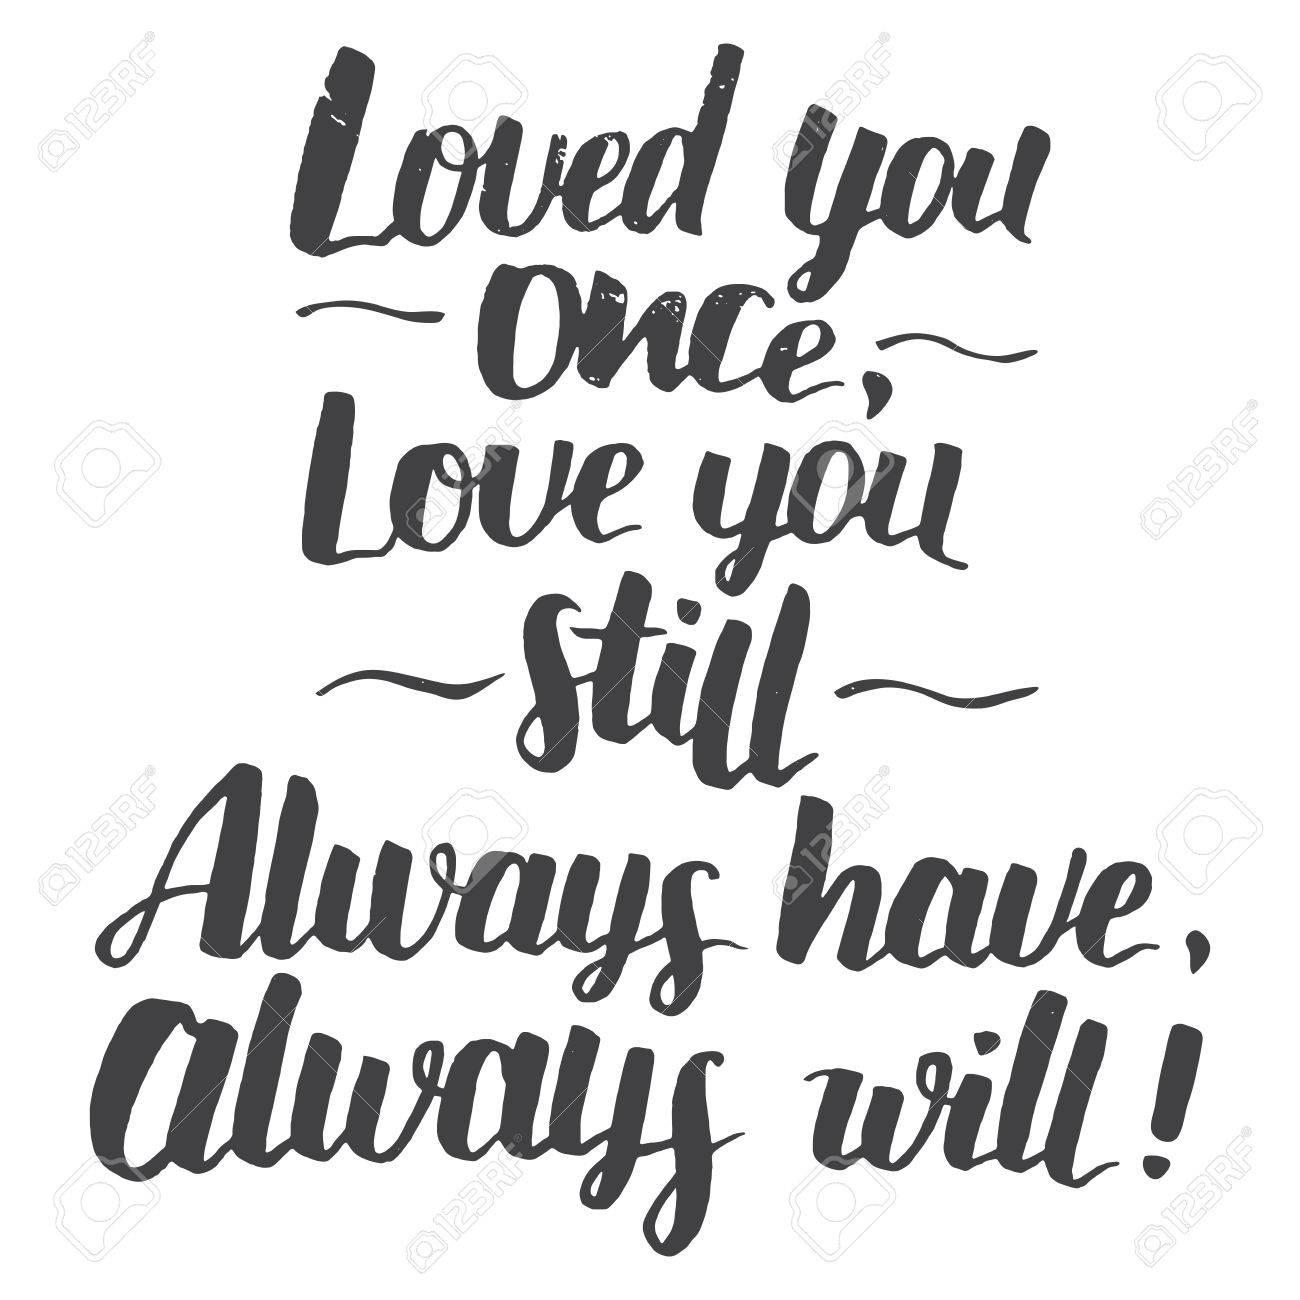 ich lieb dich noch